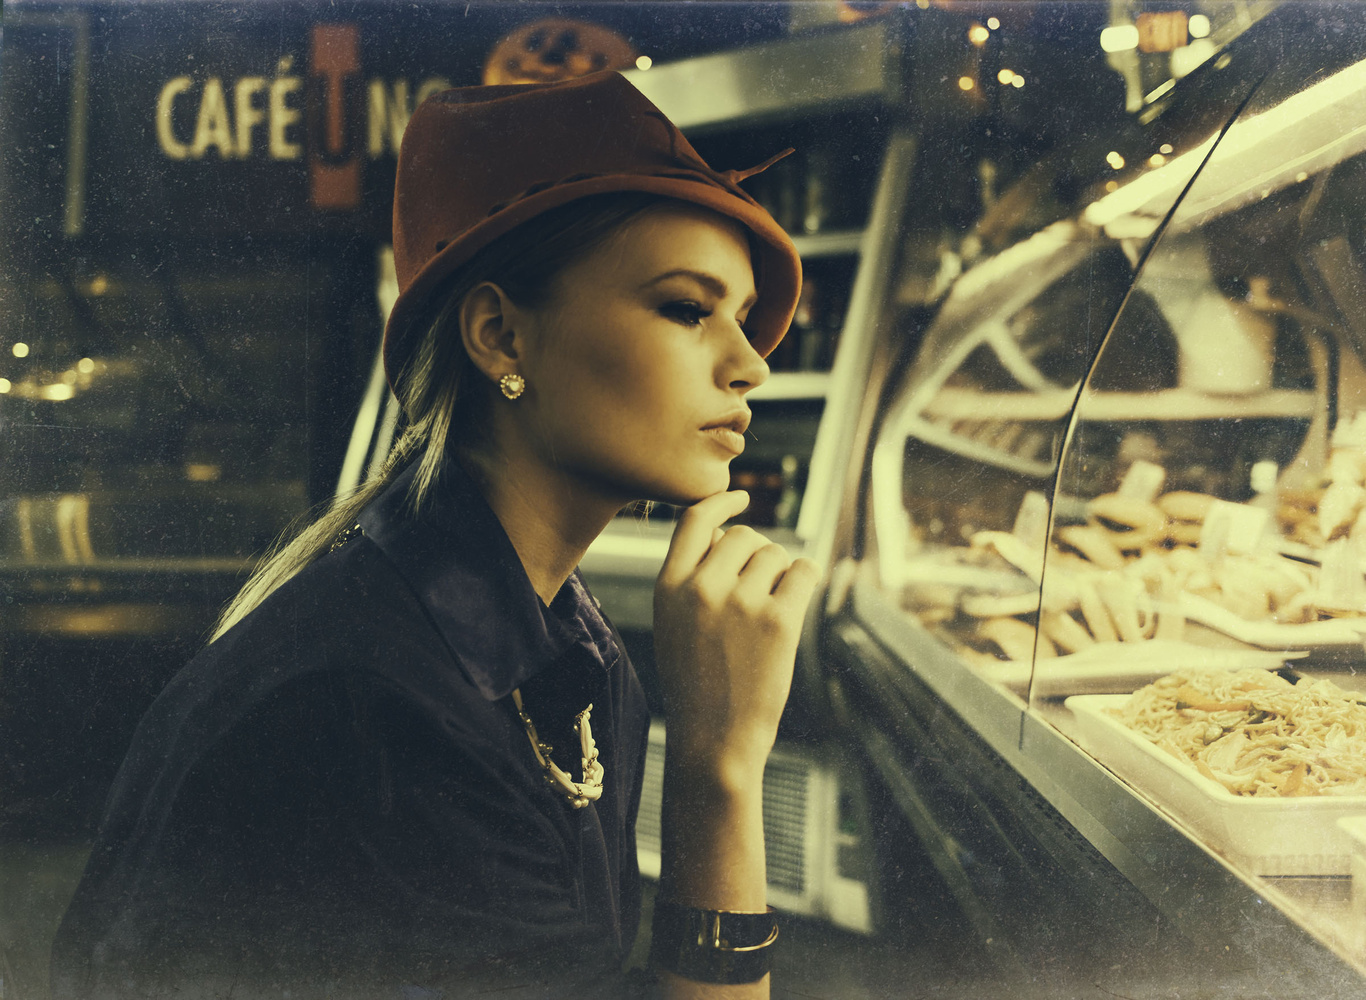 cafe. by Ian Pettigrew